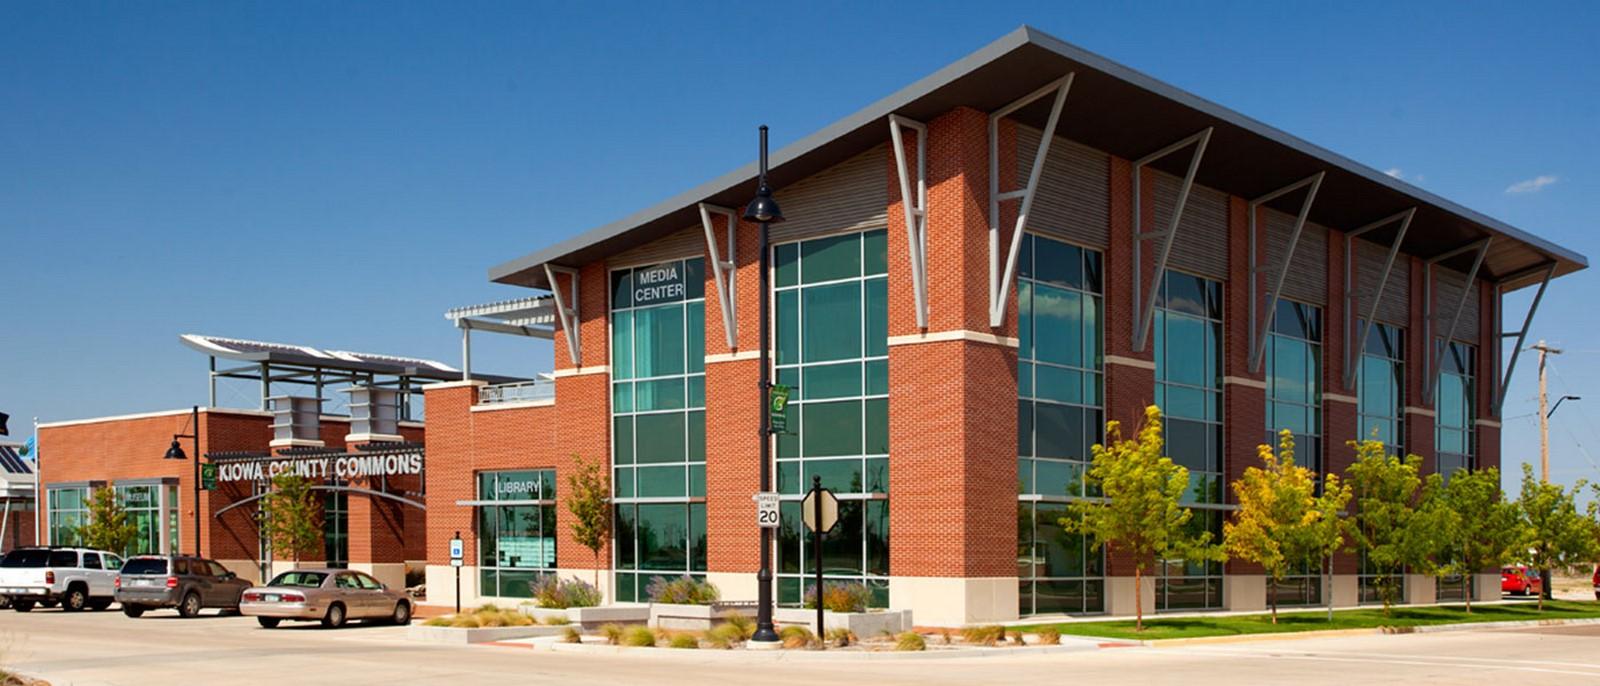 Architects in Kansas city - Top 90 Architects in Kansas city - Sheet25